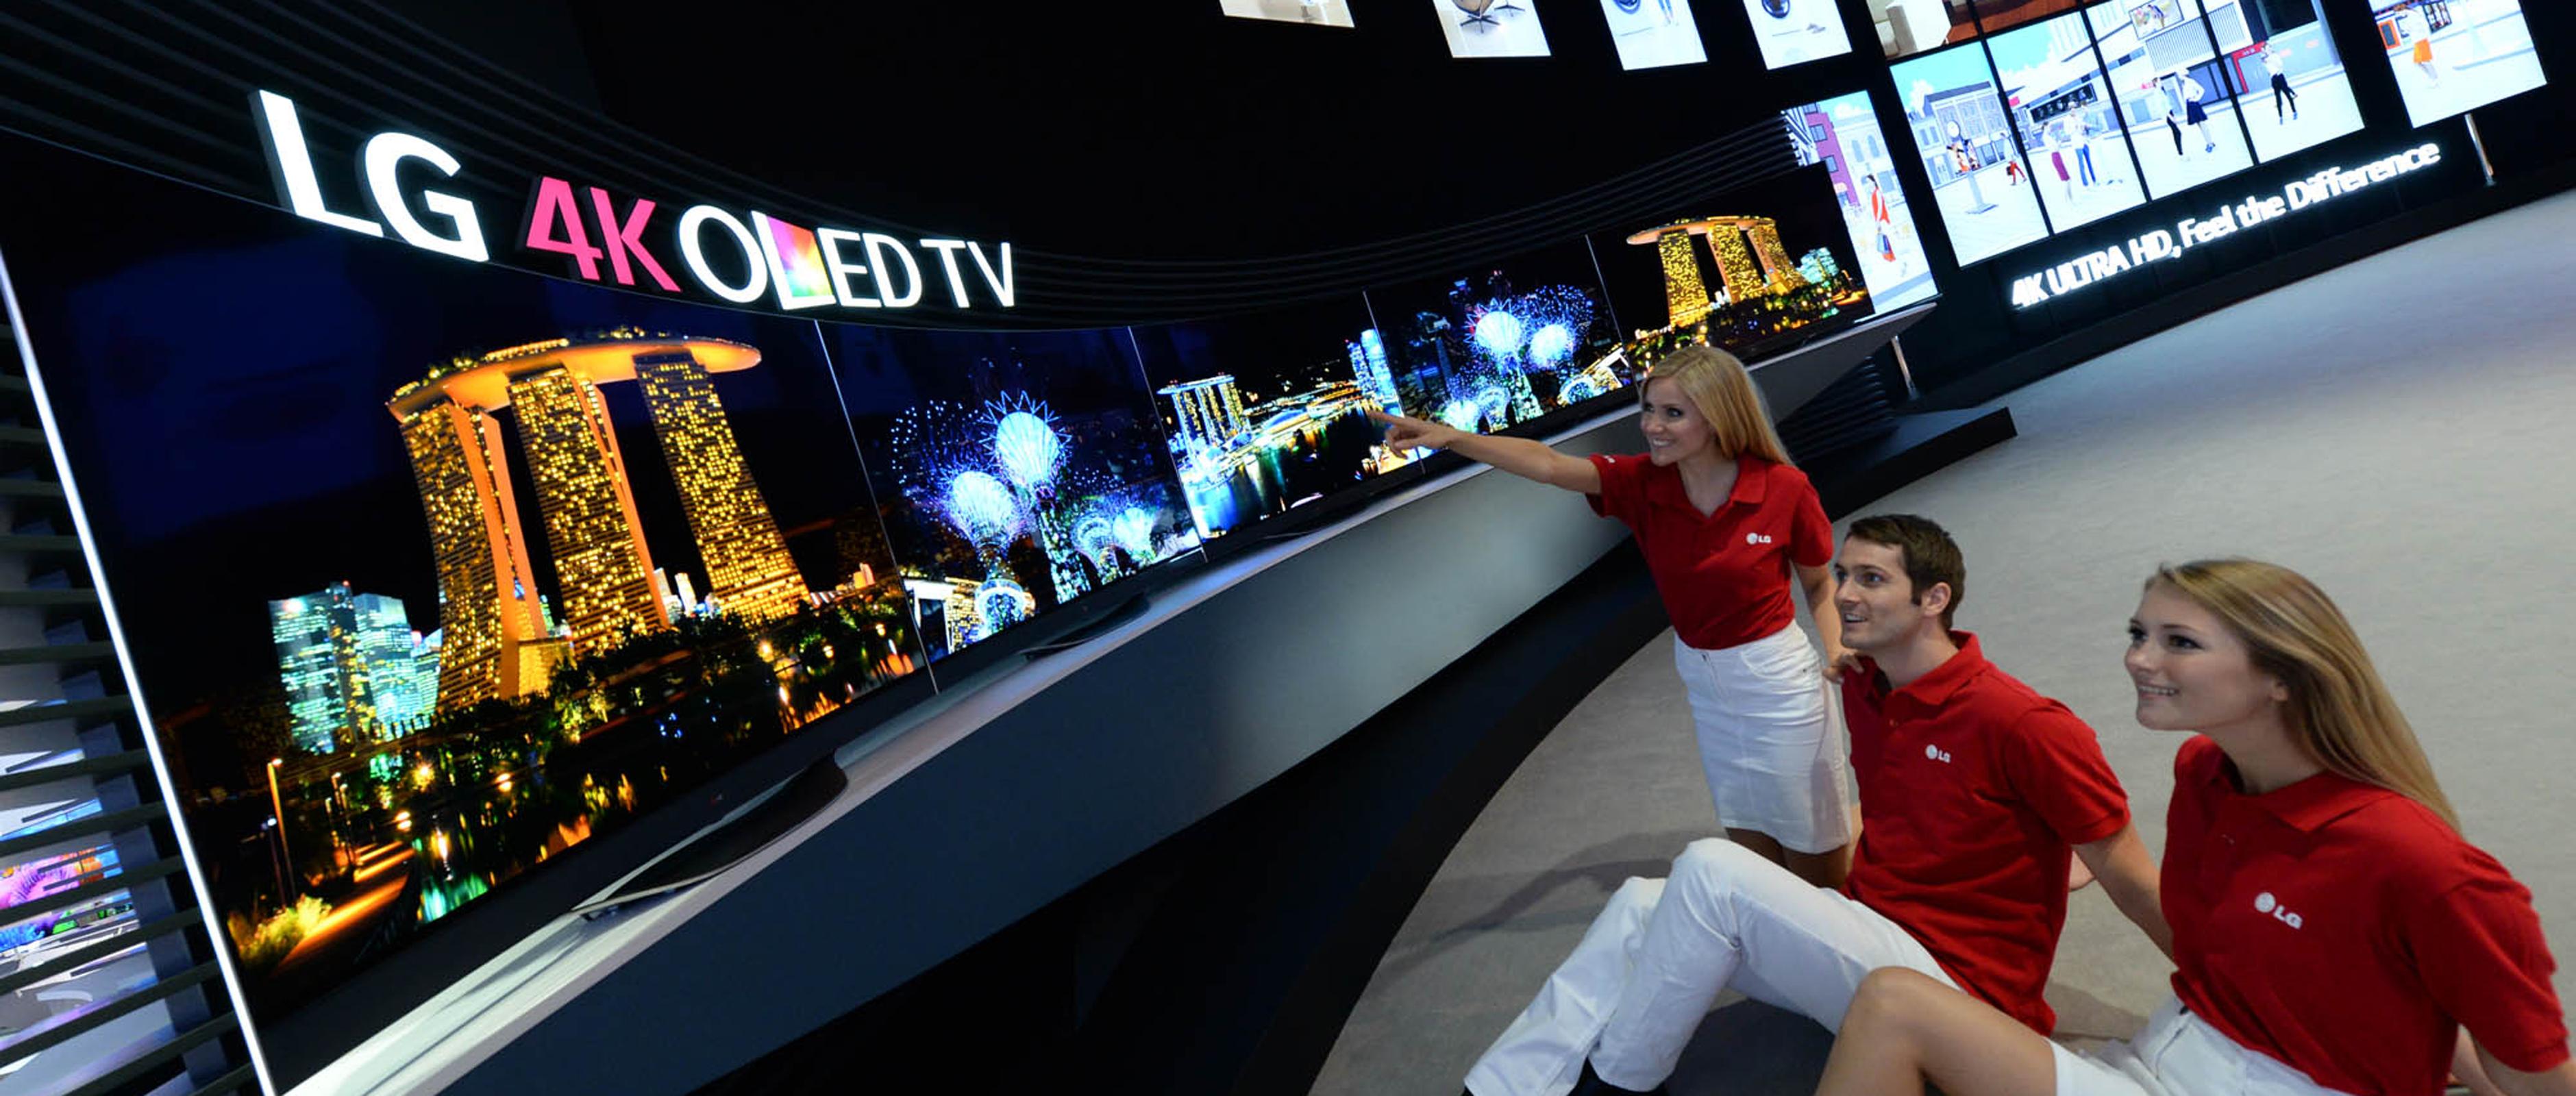 Lg Flaunts Flexible 4k Oled Tv 21 9 Uhd Display 4k